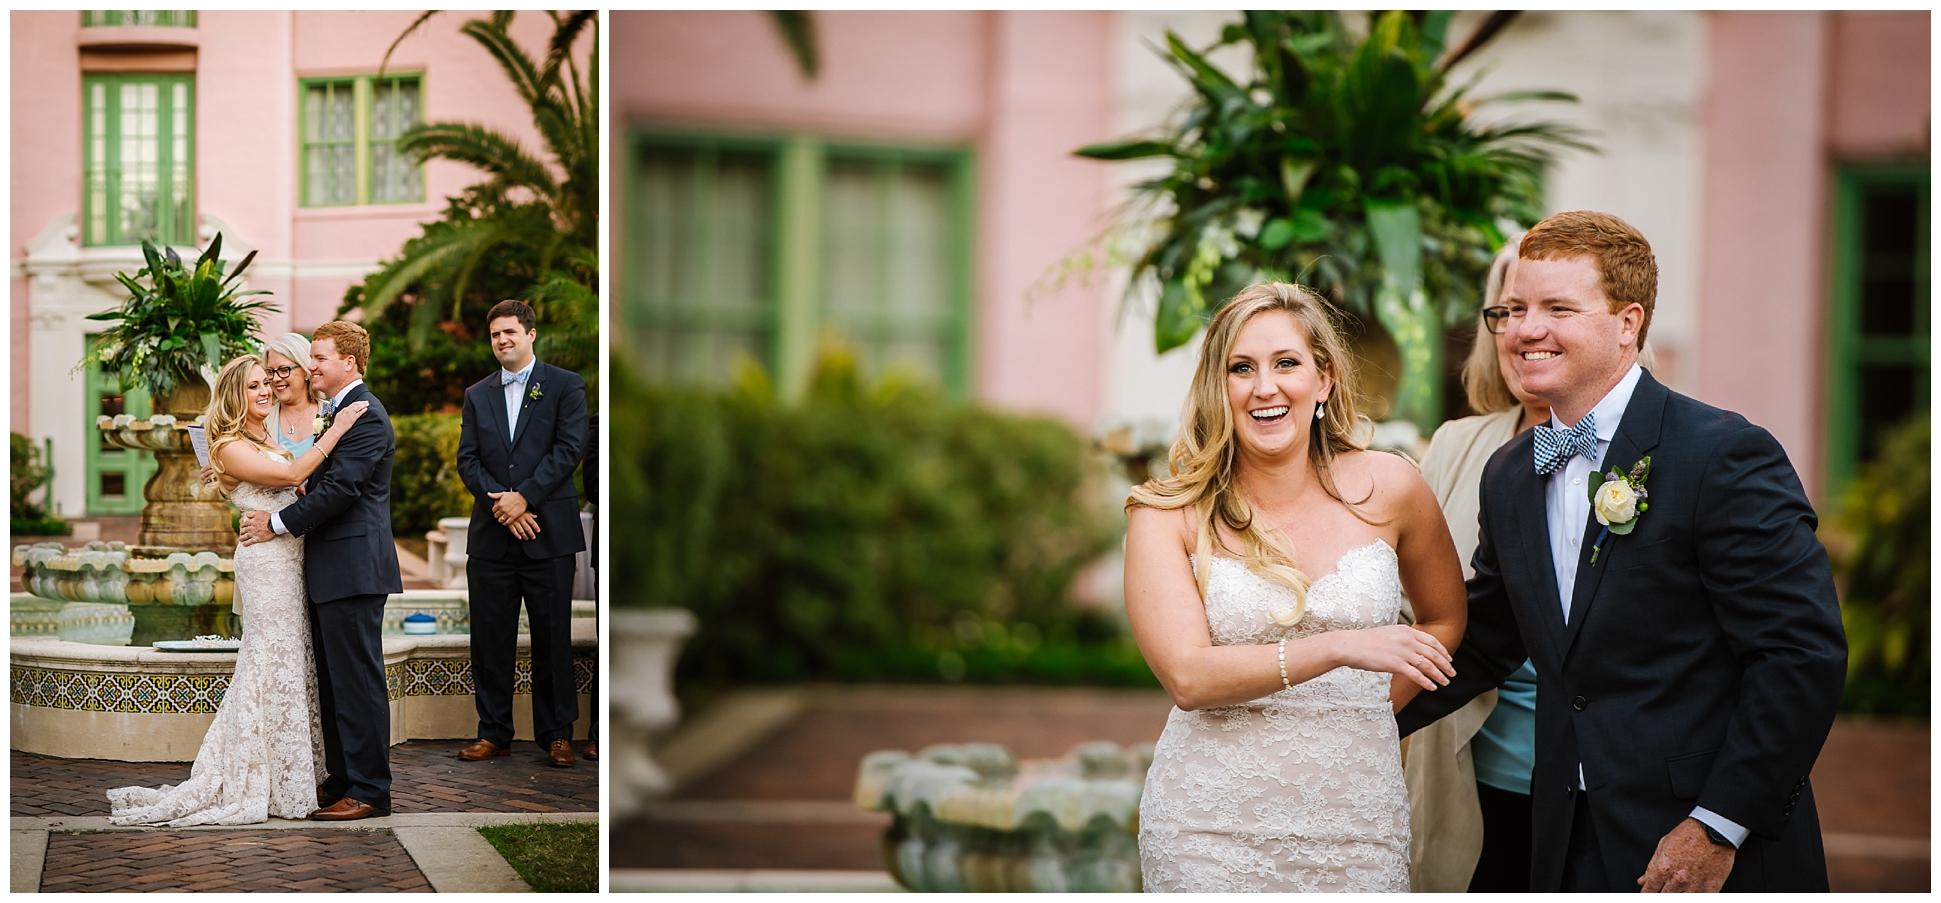 St-pete-wedding-photographer-grand-ballroom-vinoy-tea-garden-greek-luxury_0161.jpg